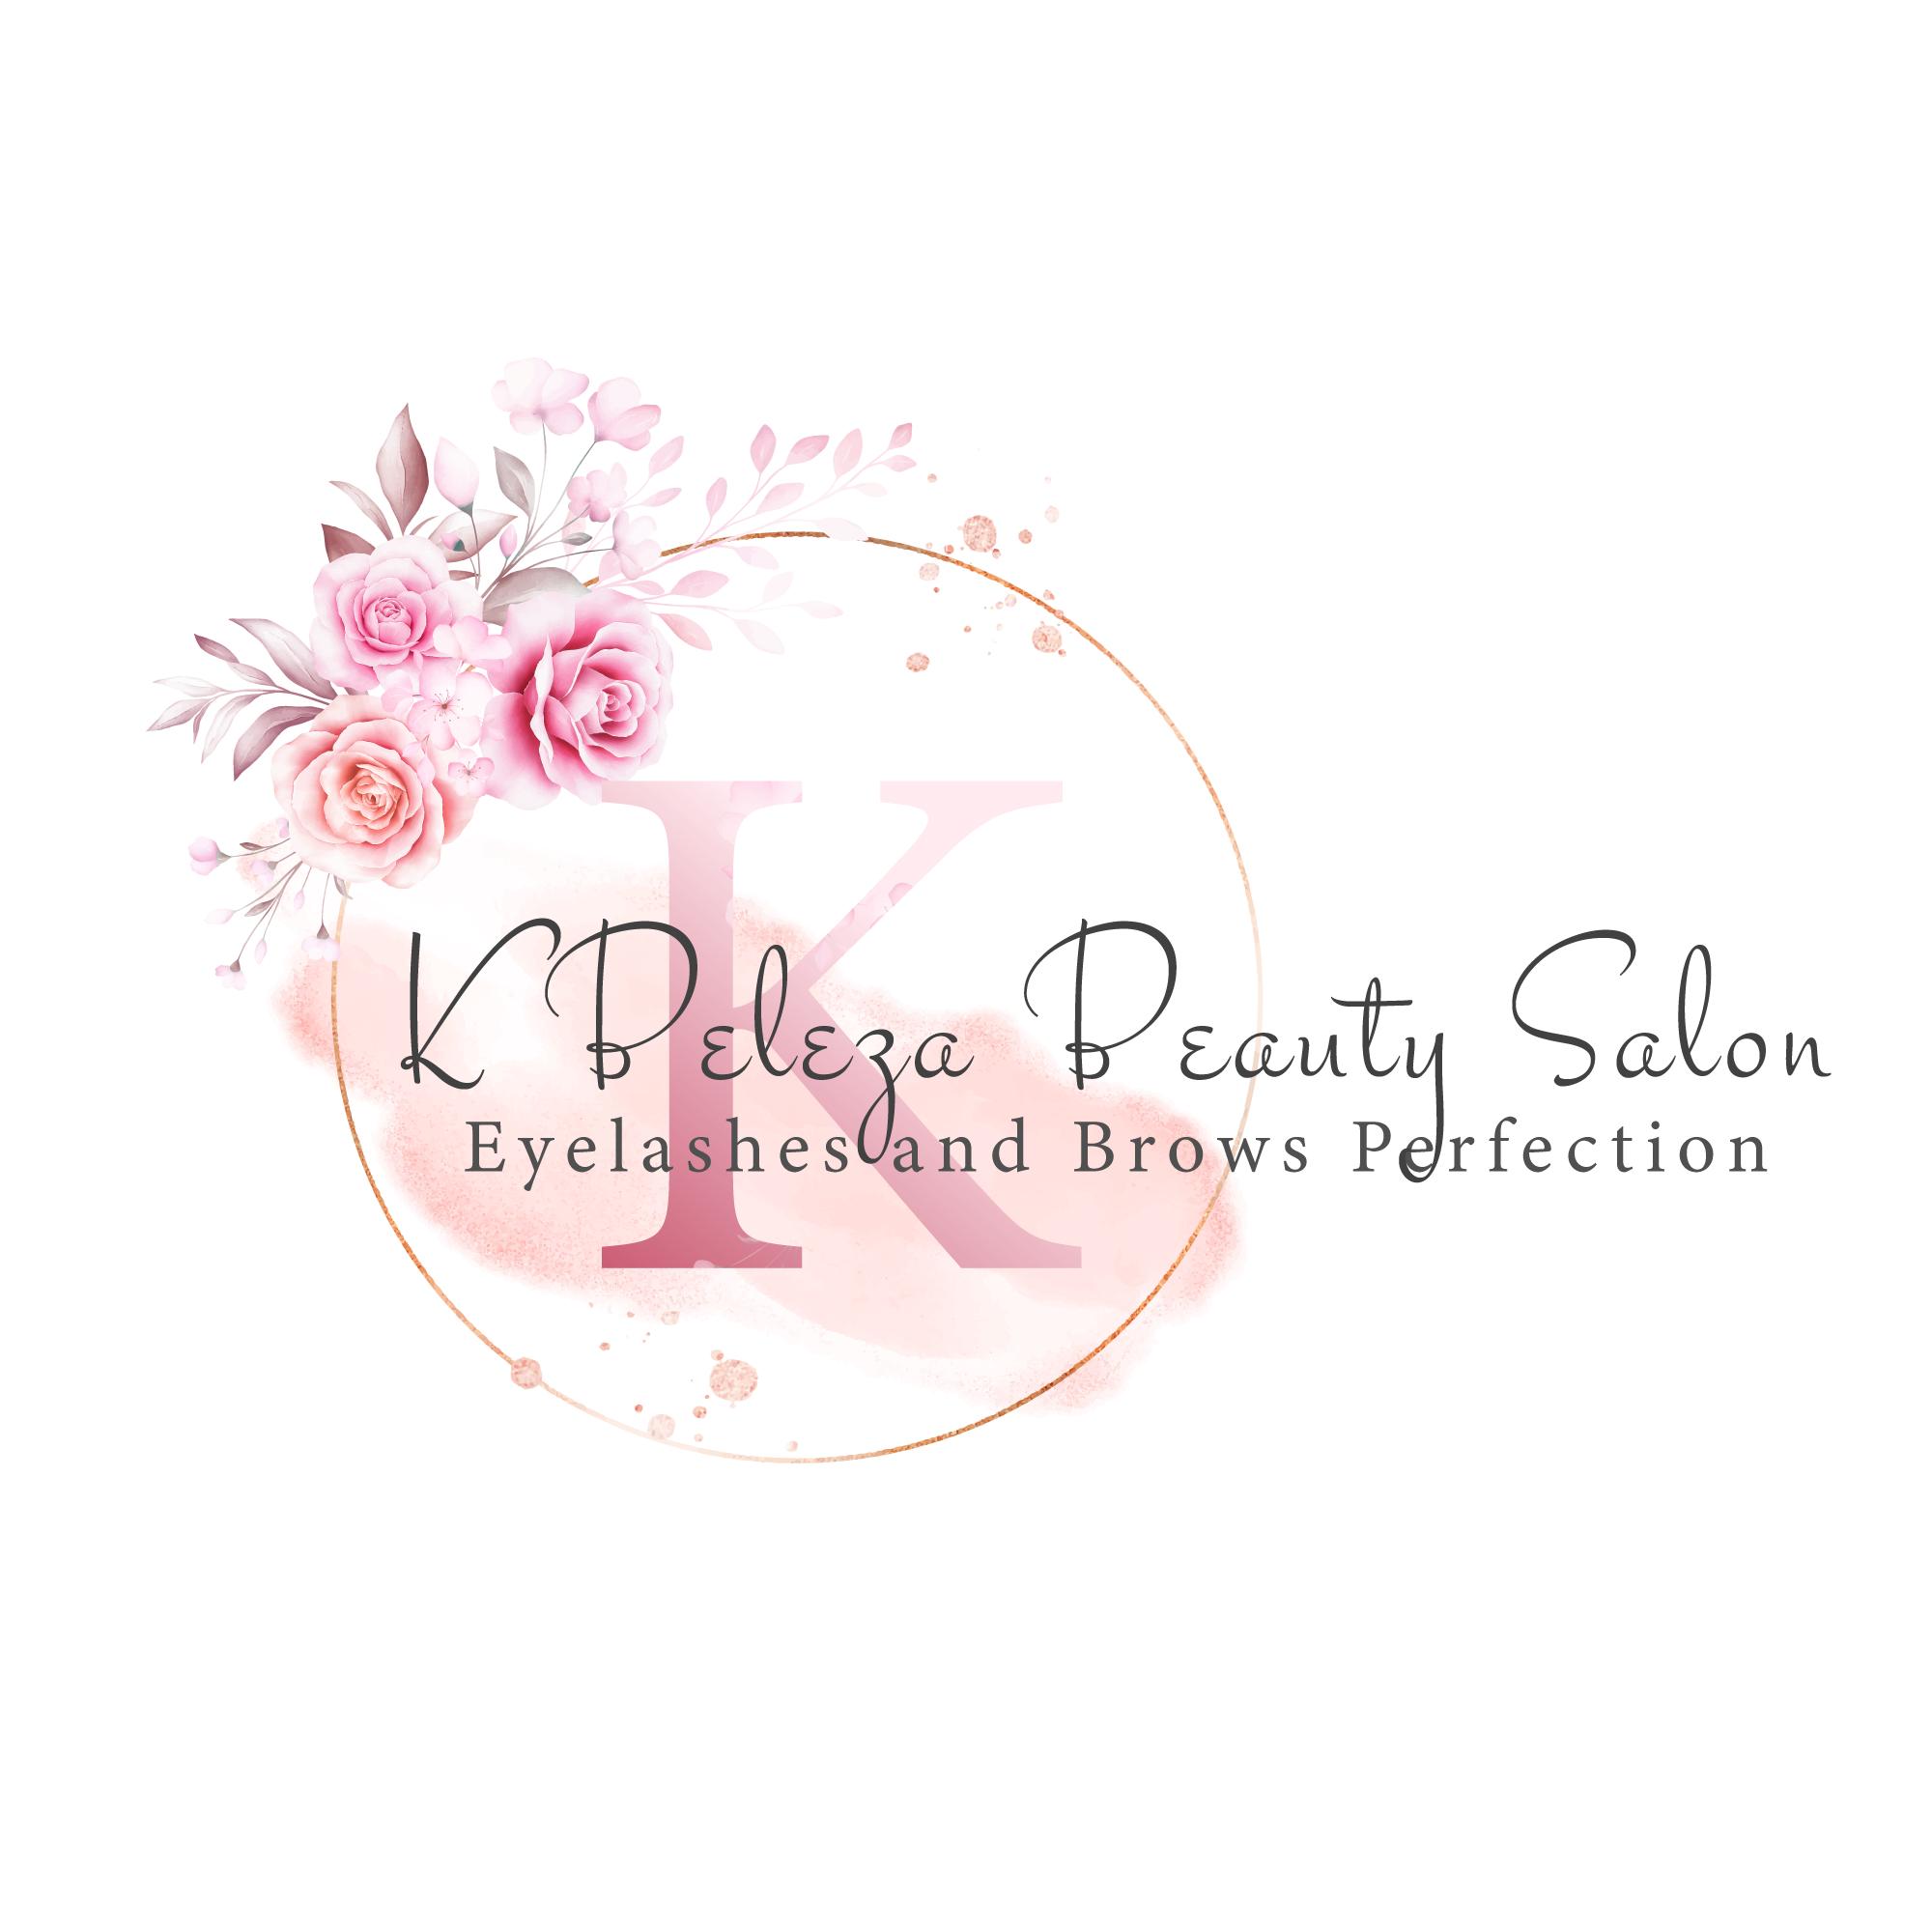 K Beleza Beauty Salon